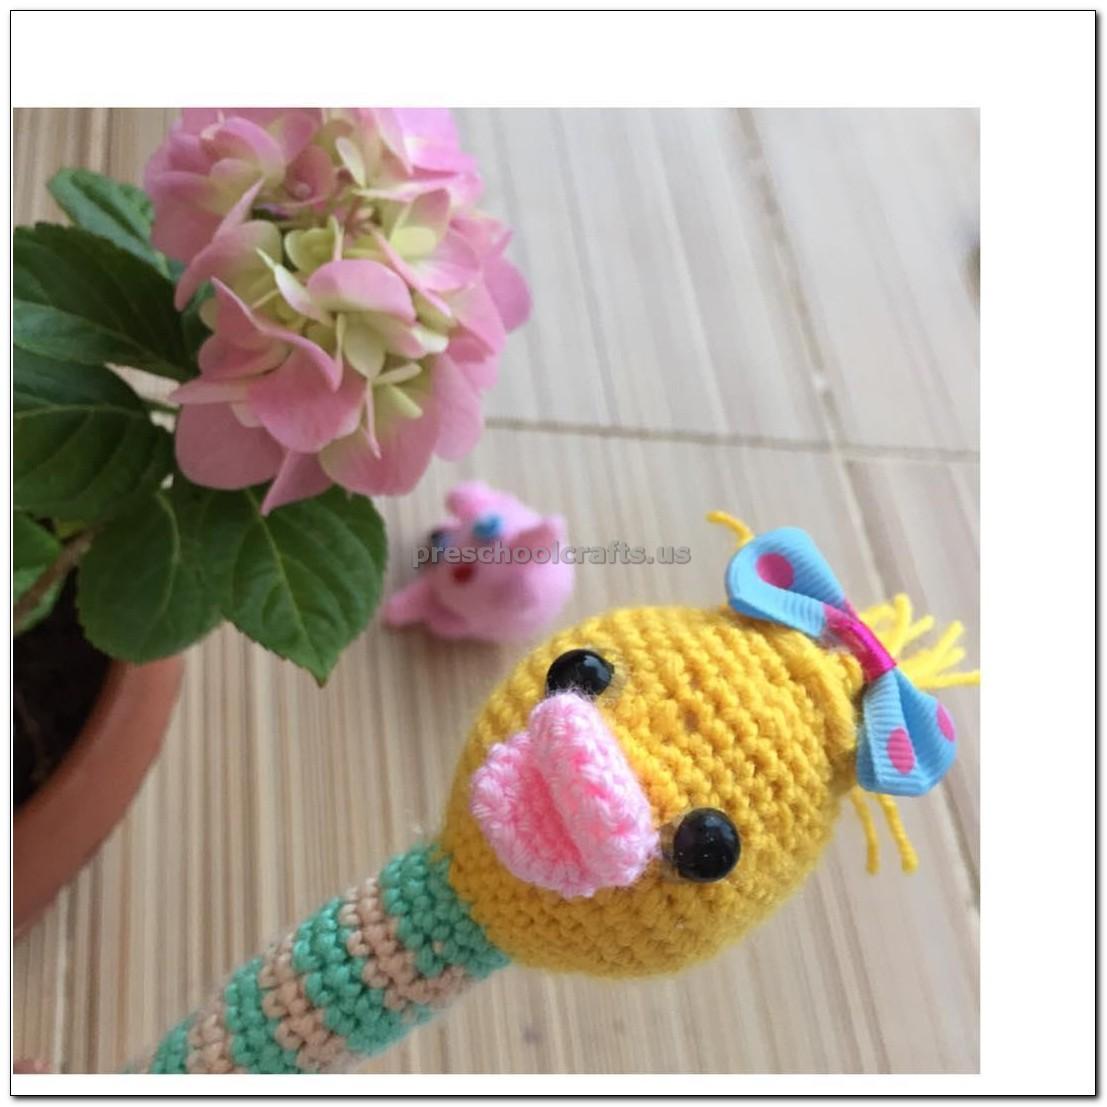 Woodpecker Crafts For Preschool